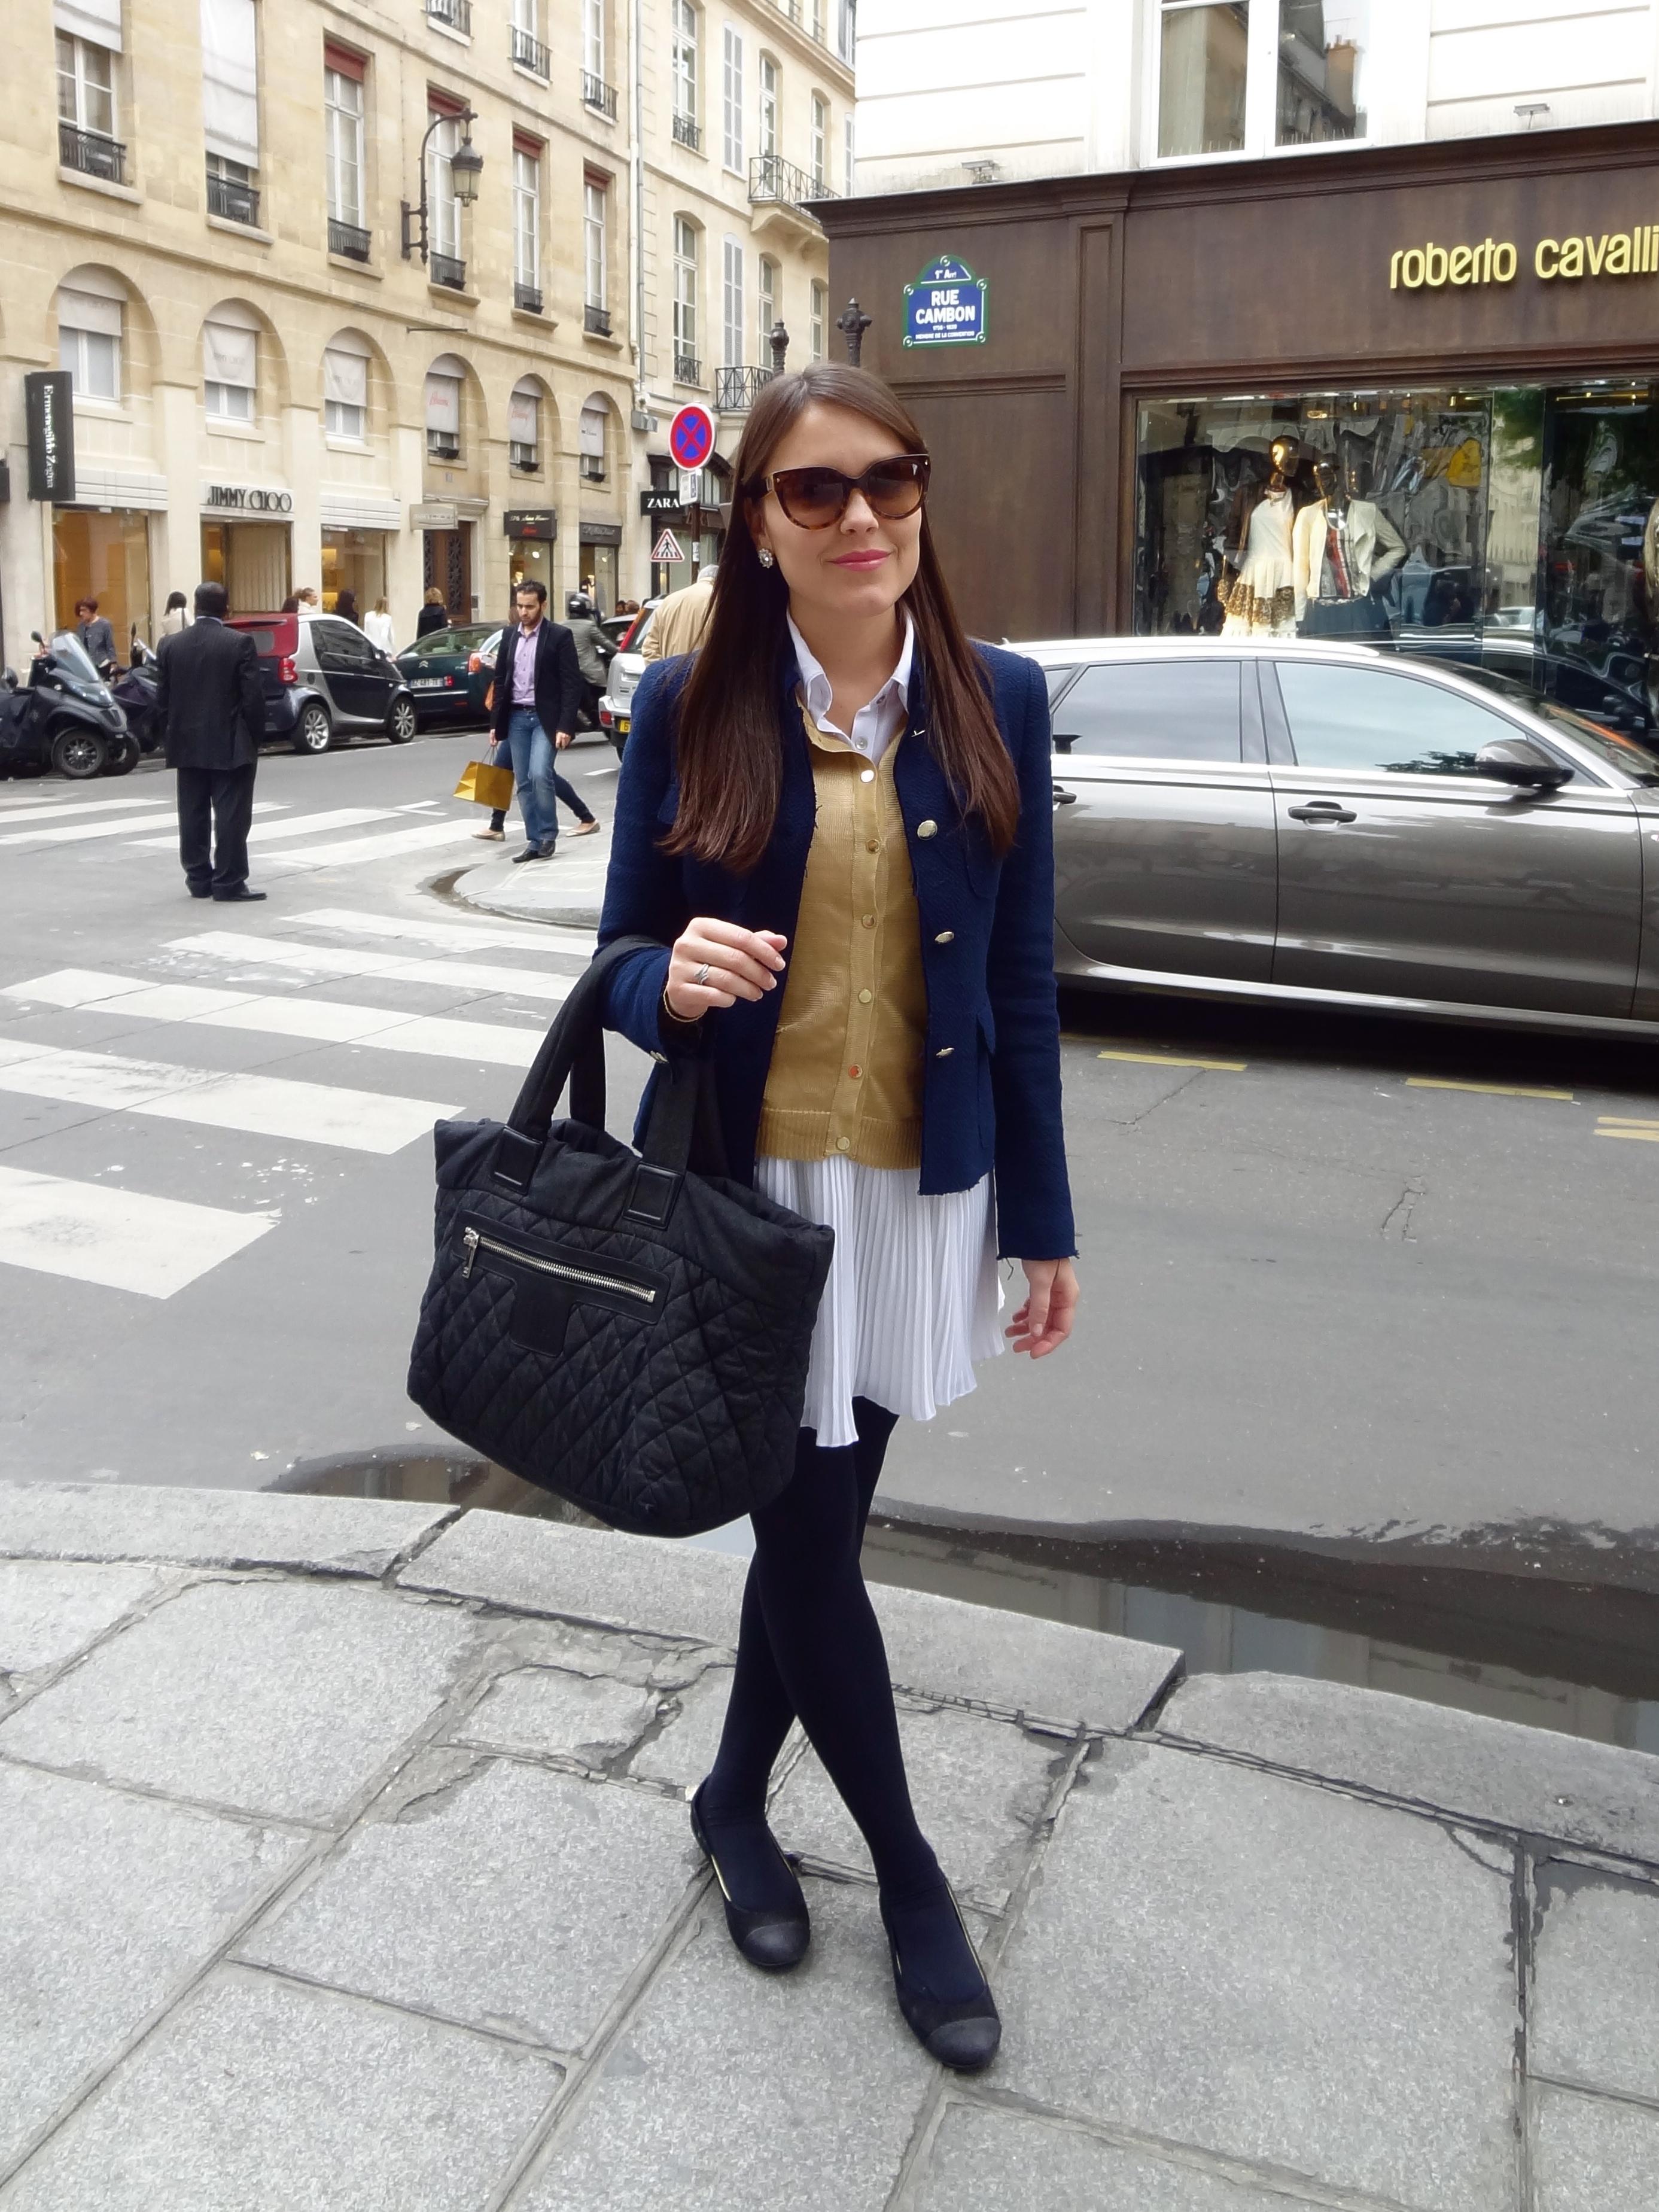 FaubourgSainthonore-sainthonore-rue-paris-dicasdeparis-dicadeparis-blogdalari-lariduarte.com-lariduarte-larissaduarte-ruecambon-look-lookdodia-lookoftheday-lookdujour